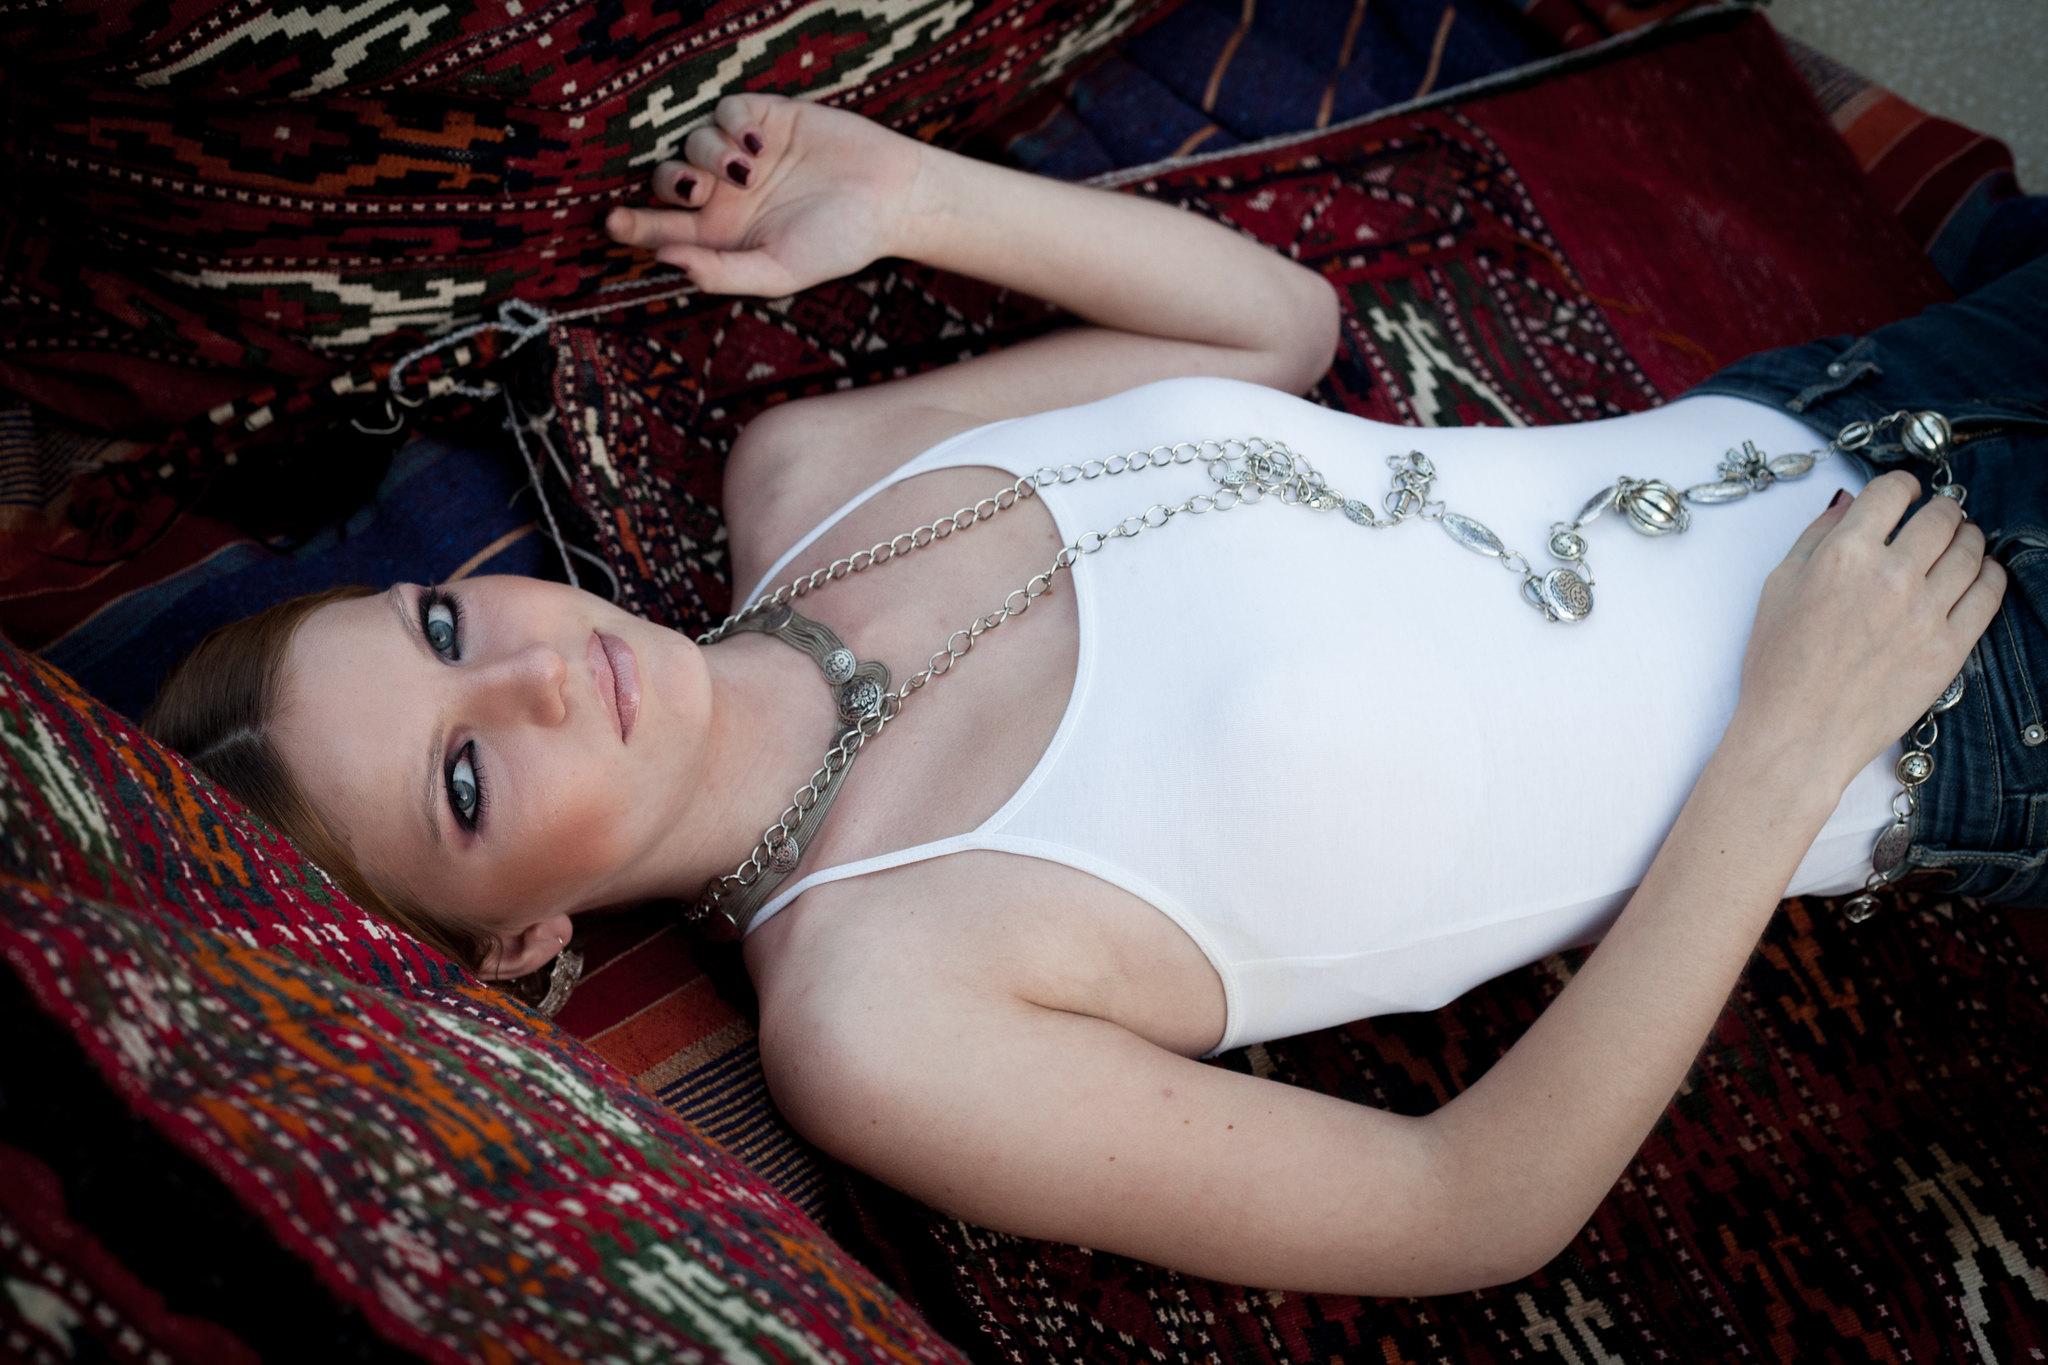 Stunning Sabrina.